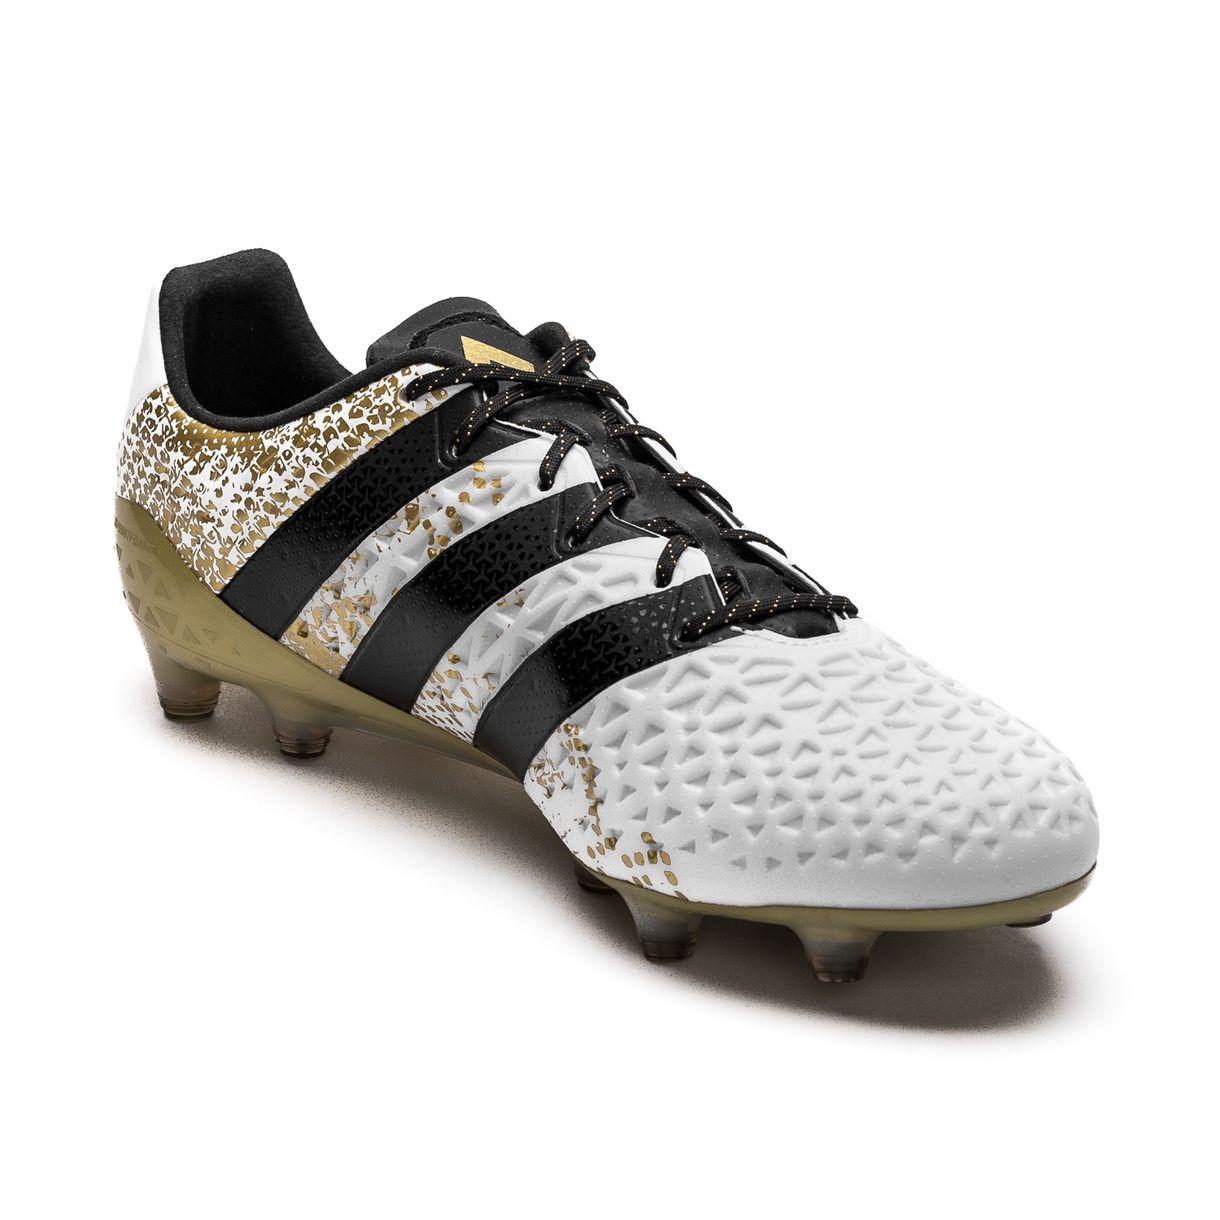 7b8245b0f ... Click to enlarge image  adidas_ace_16_1_fg_ag_stellar_pack_white_core_black_gold_metallic_c.jpg ...